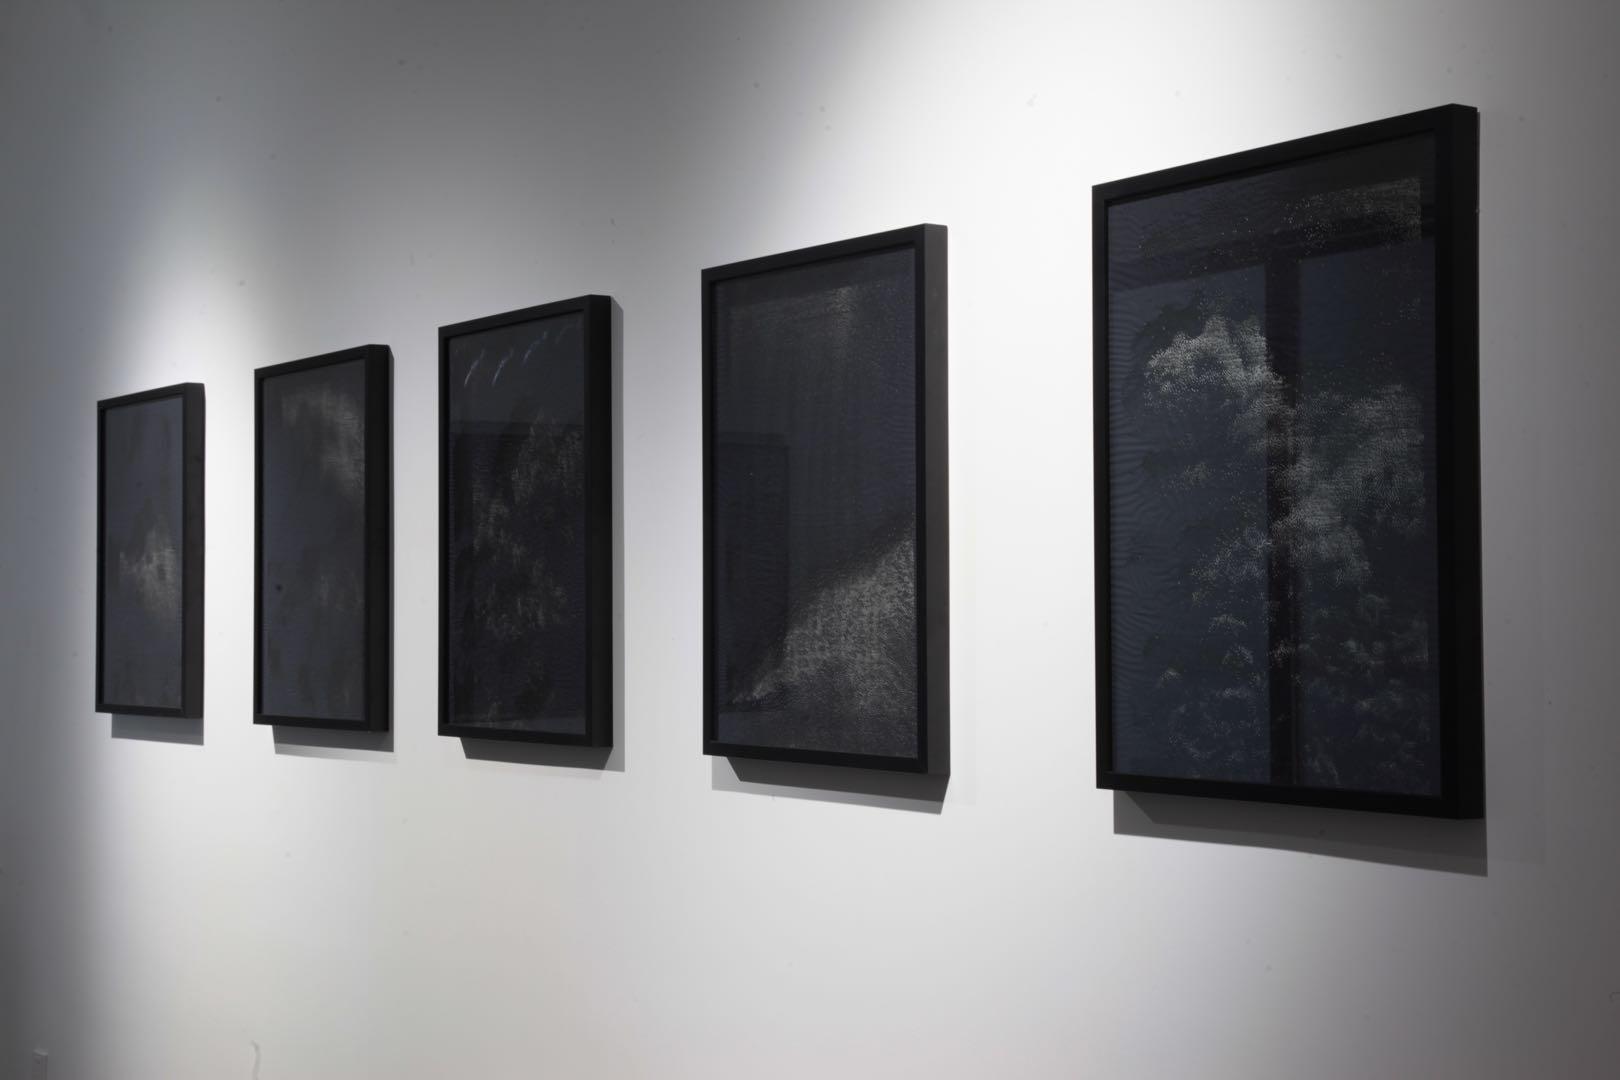 Micheal Sebastian Haas,Burning Light